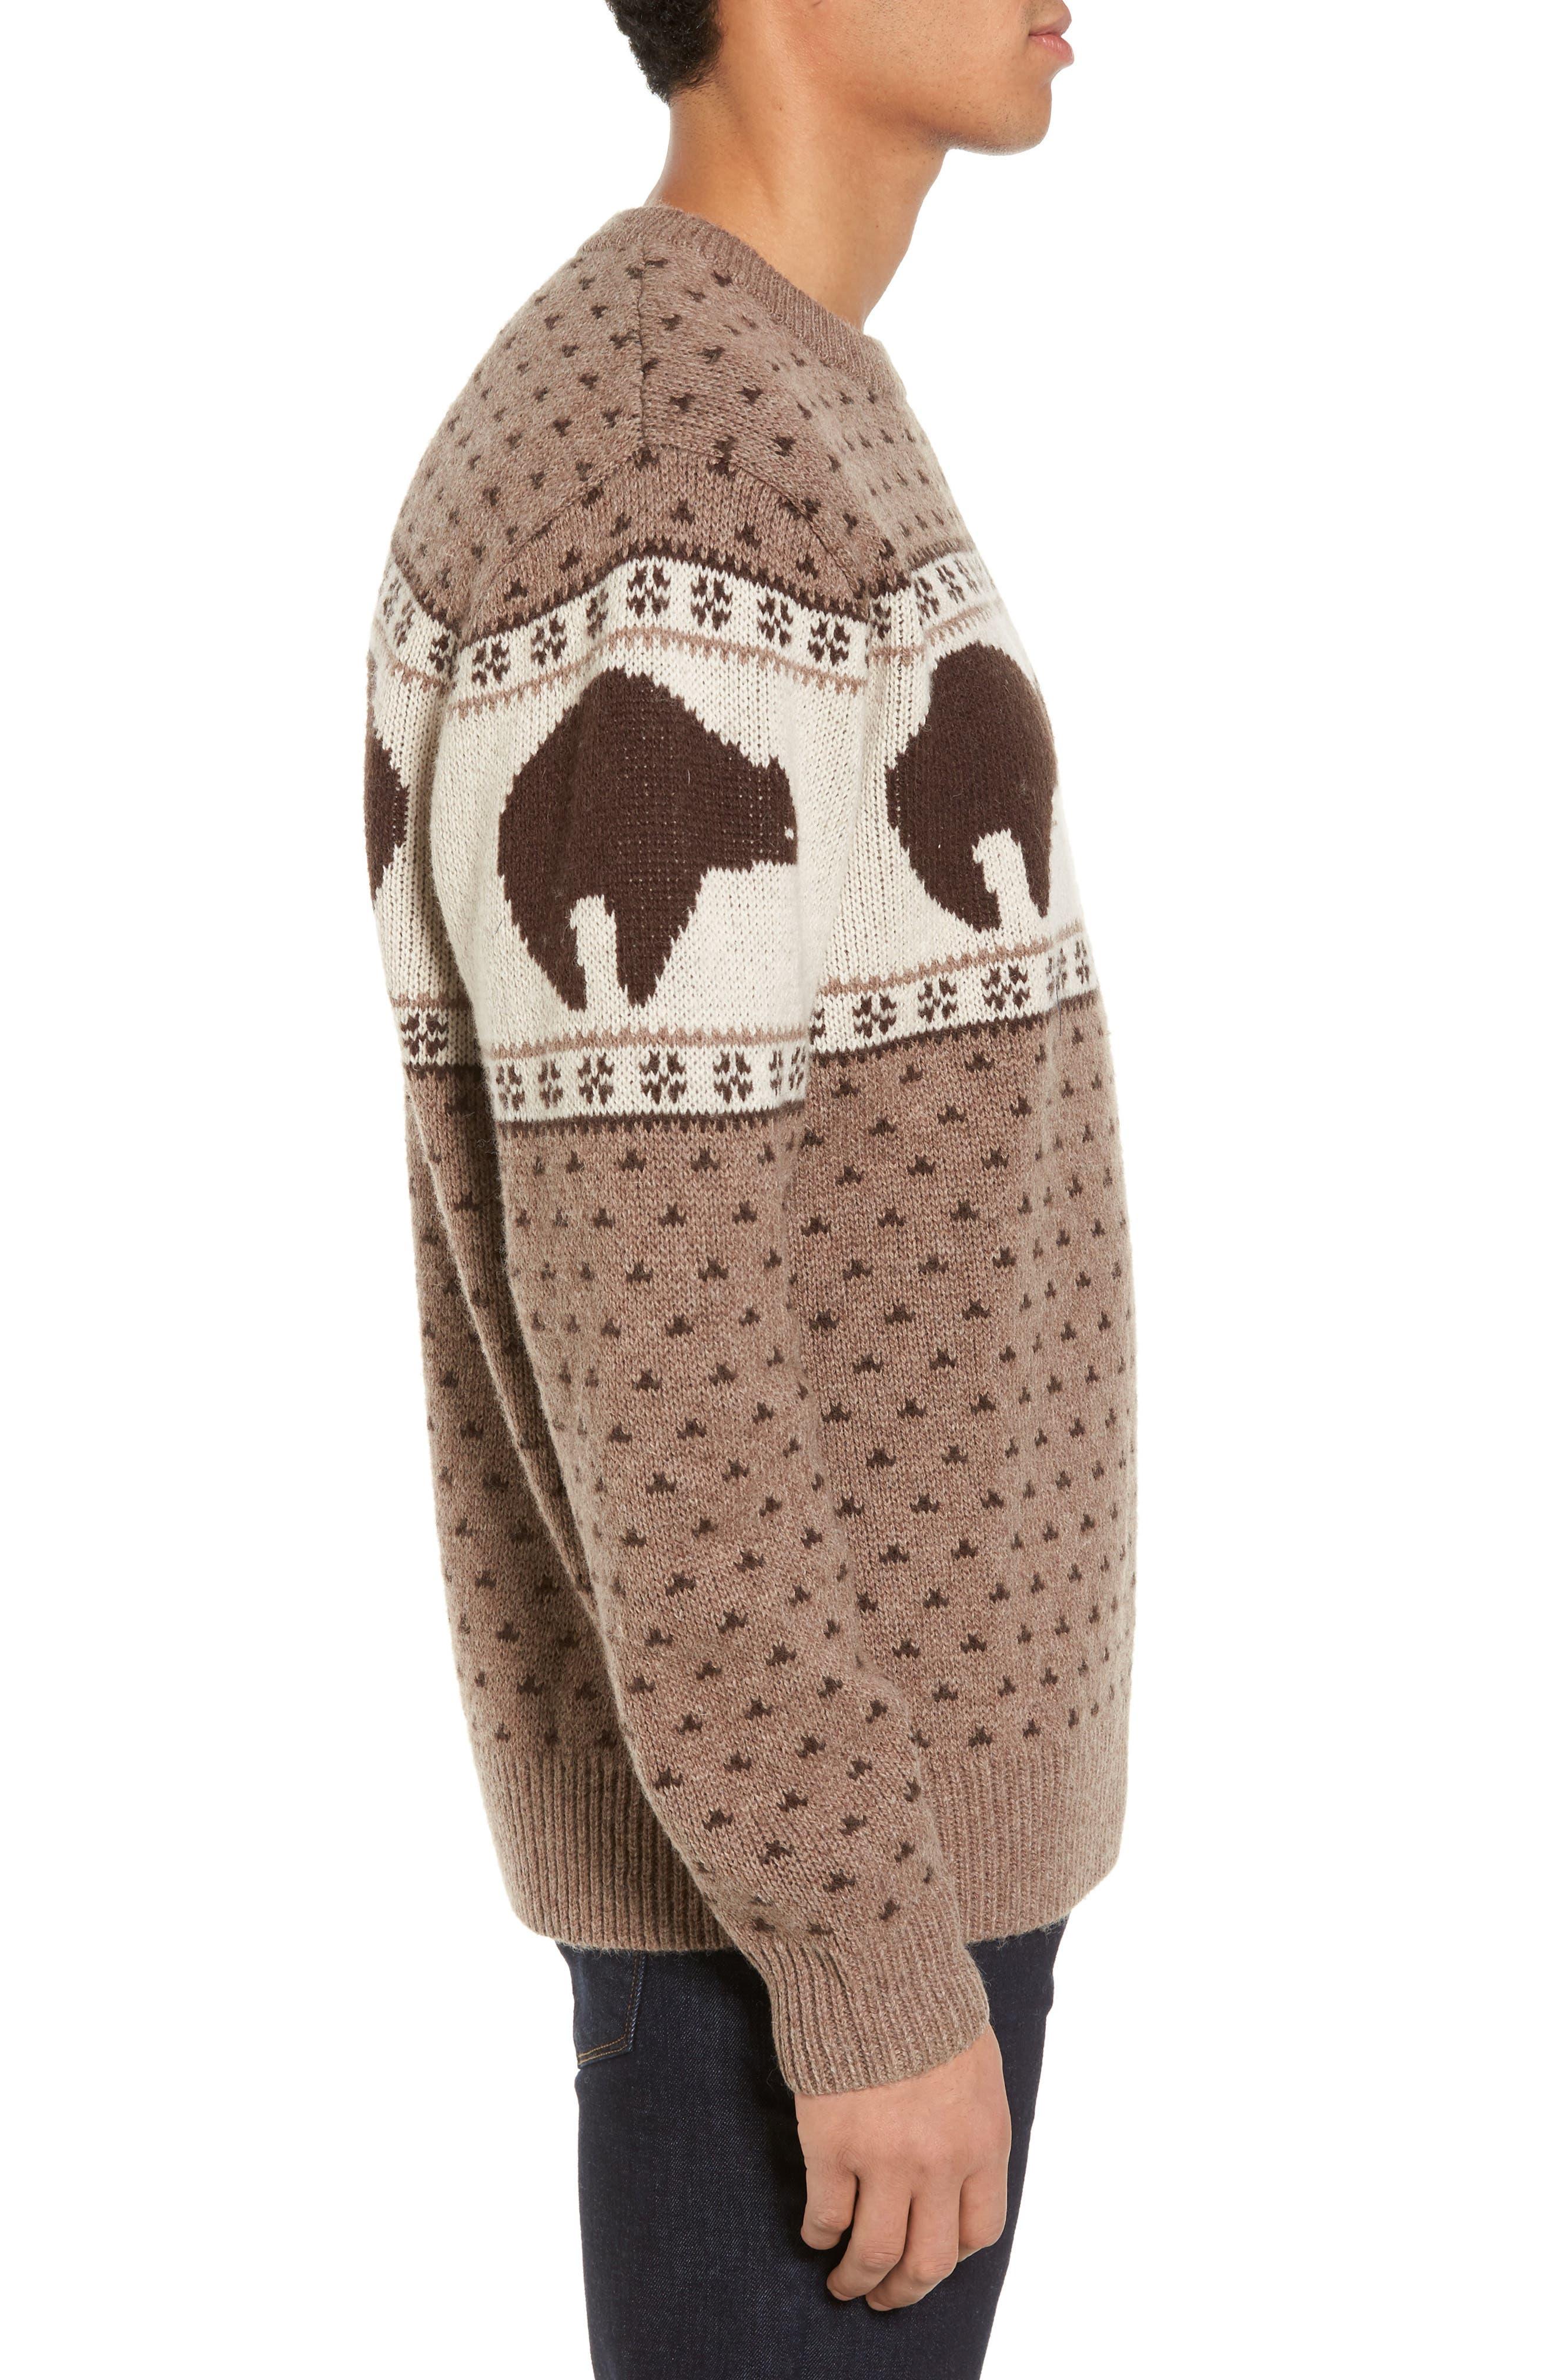 Bear Sweater,                             Alternate thumbnail 3, color,                             Brown/ Ivory Bear